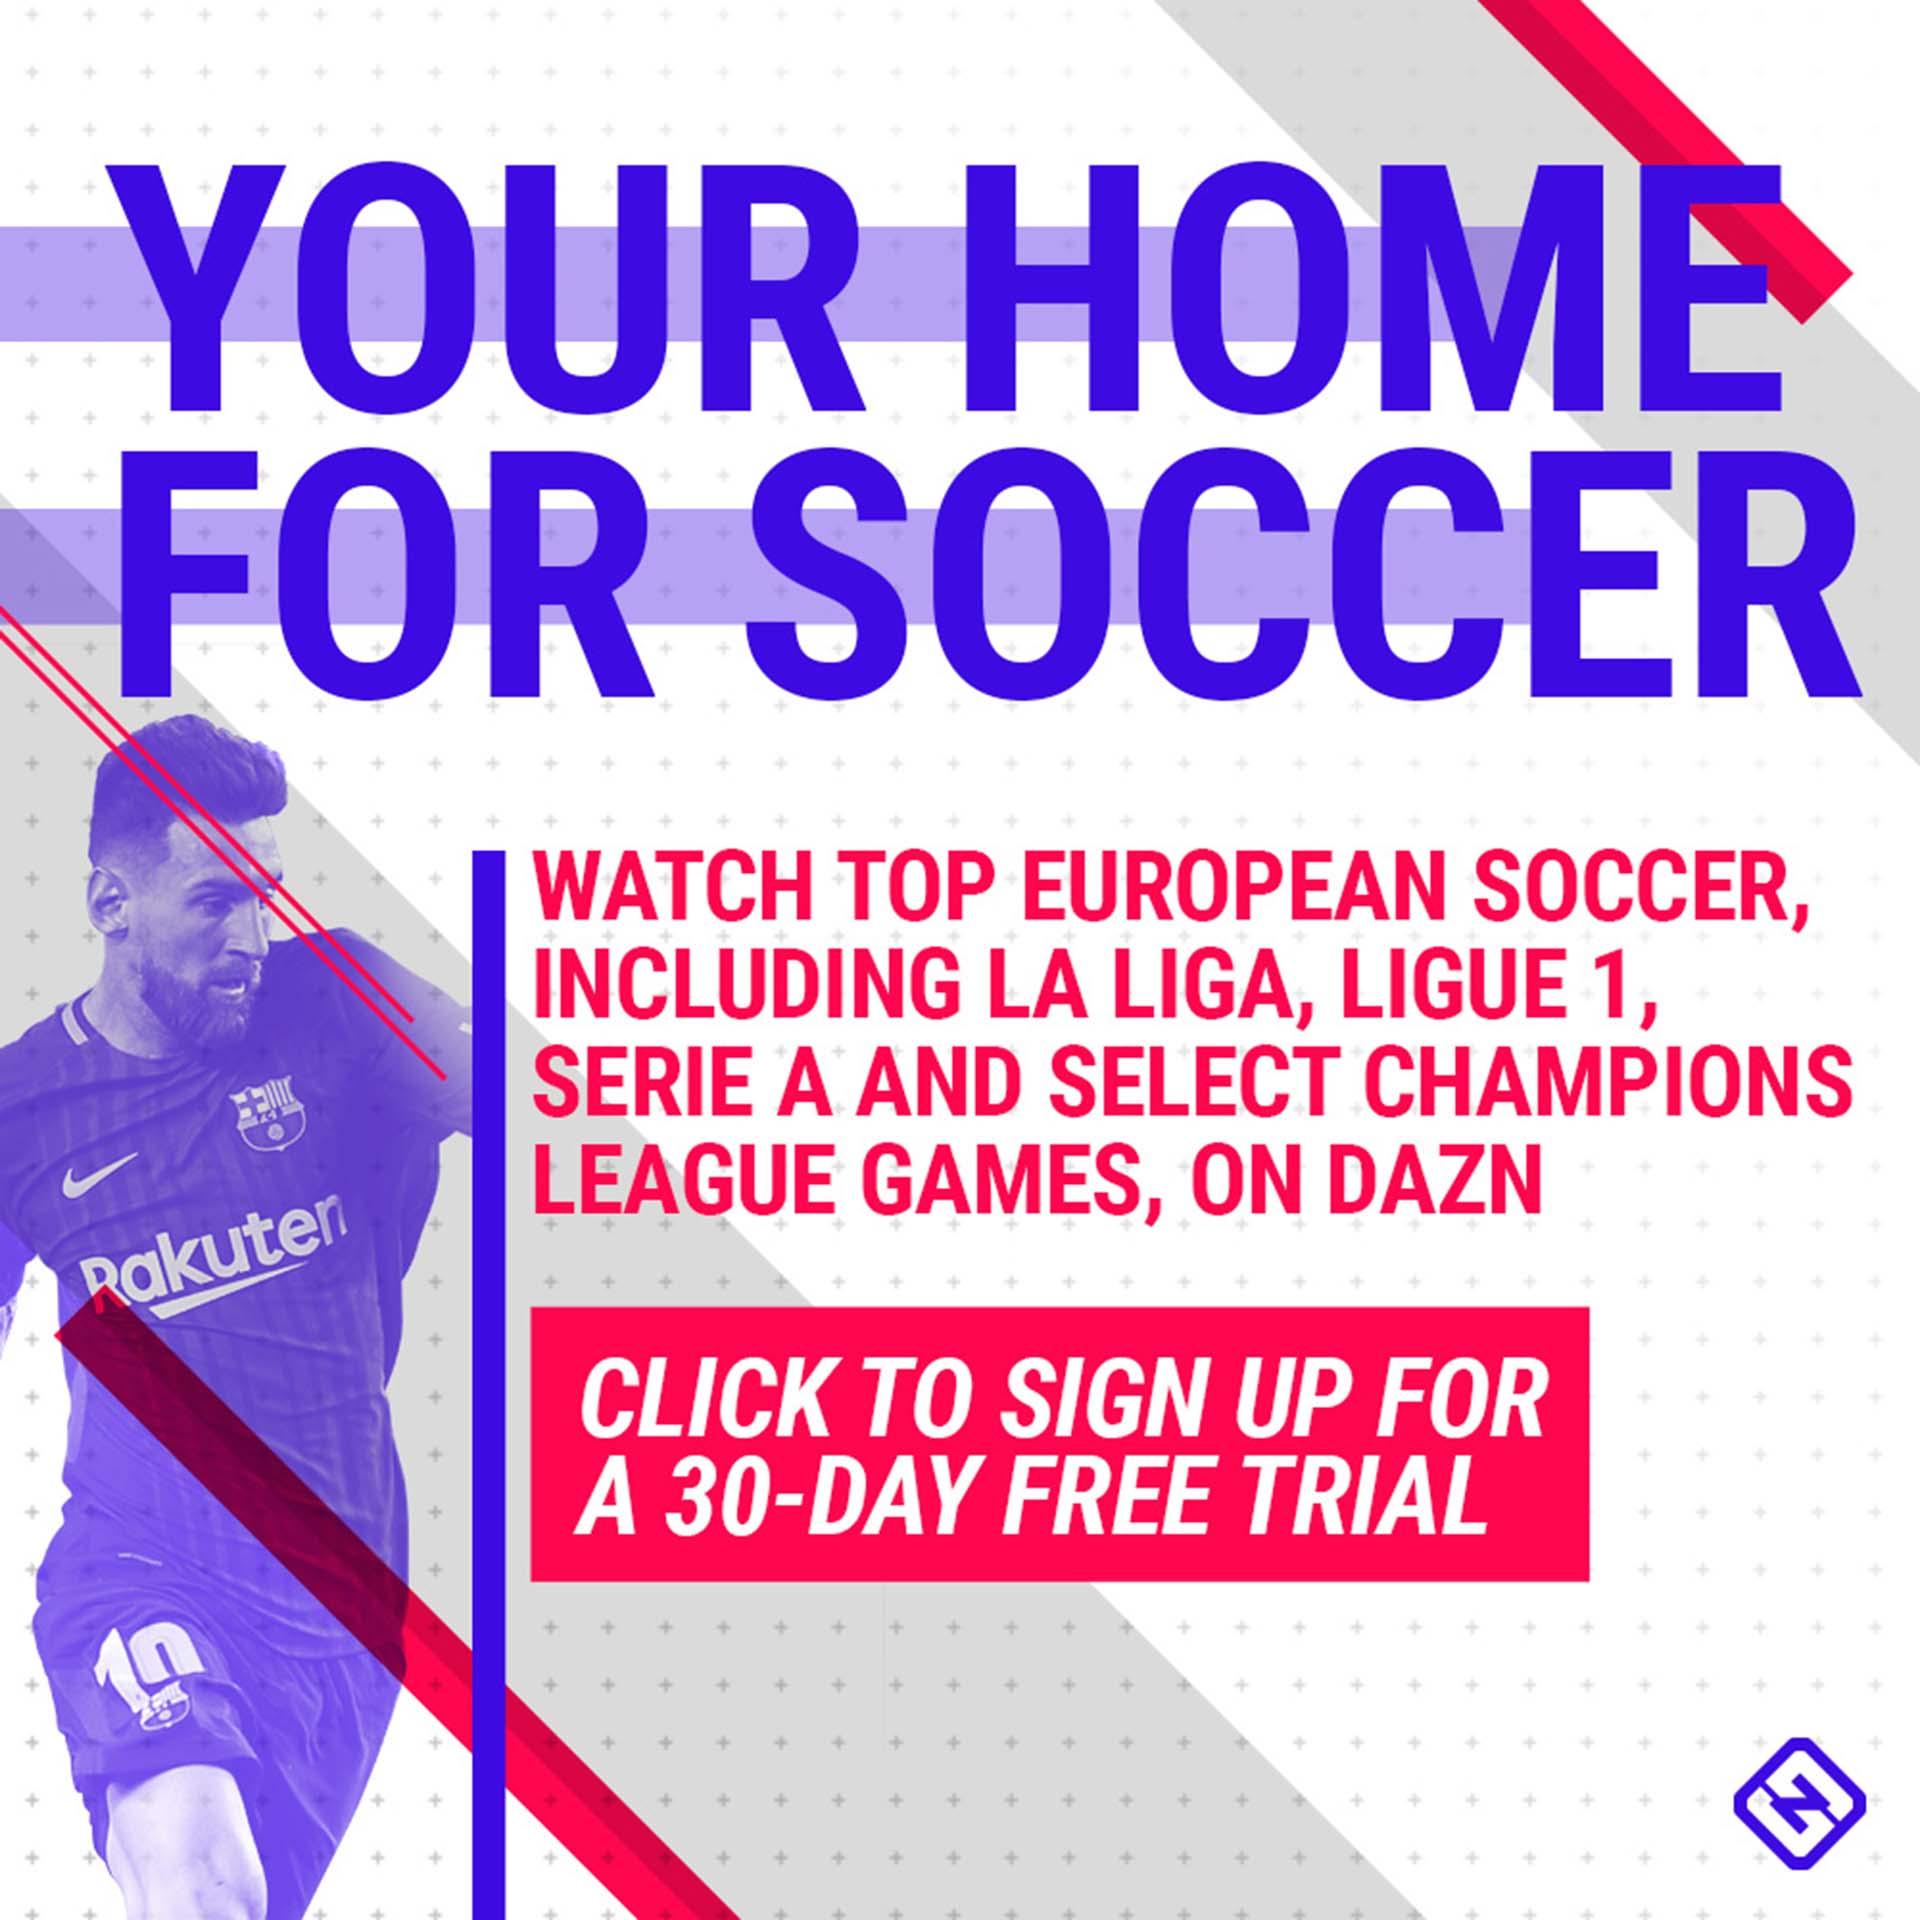 Soccer-DAZN-graphic-2